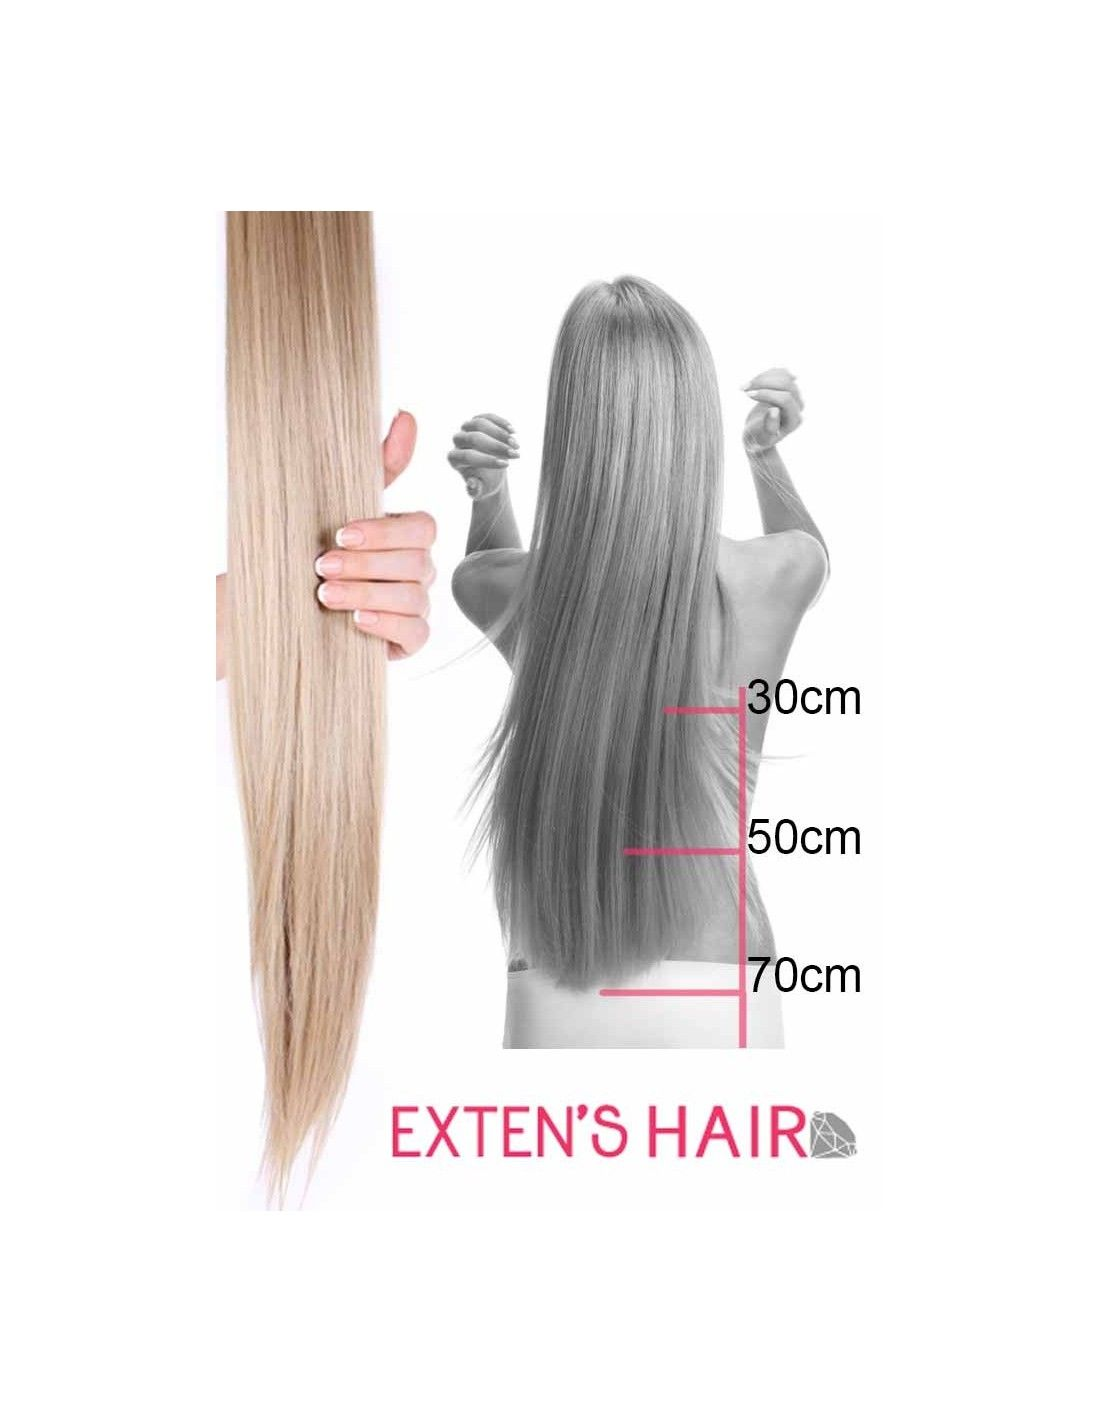 Microring extensions 70 cm